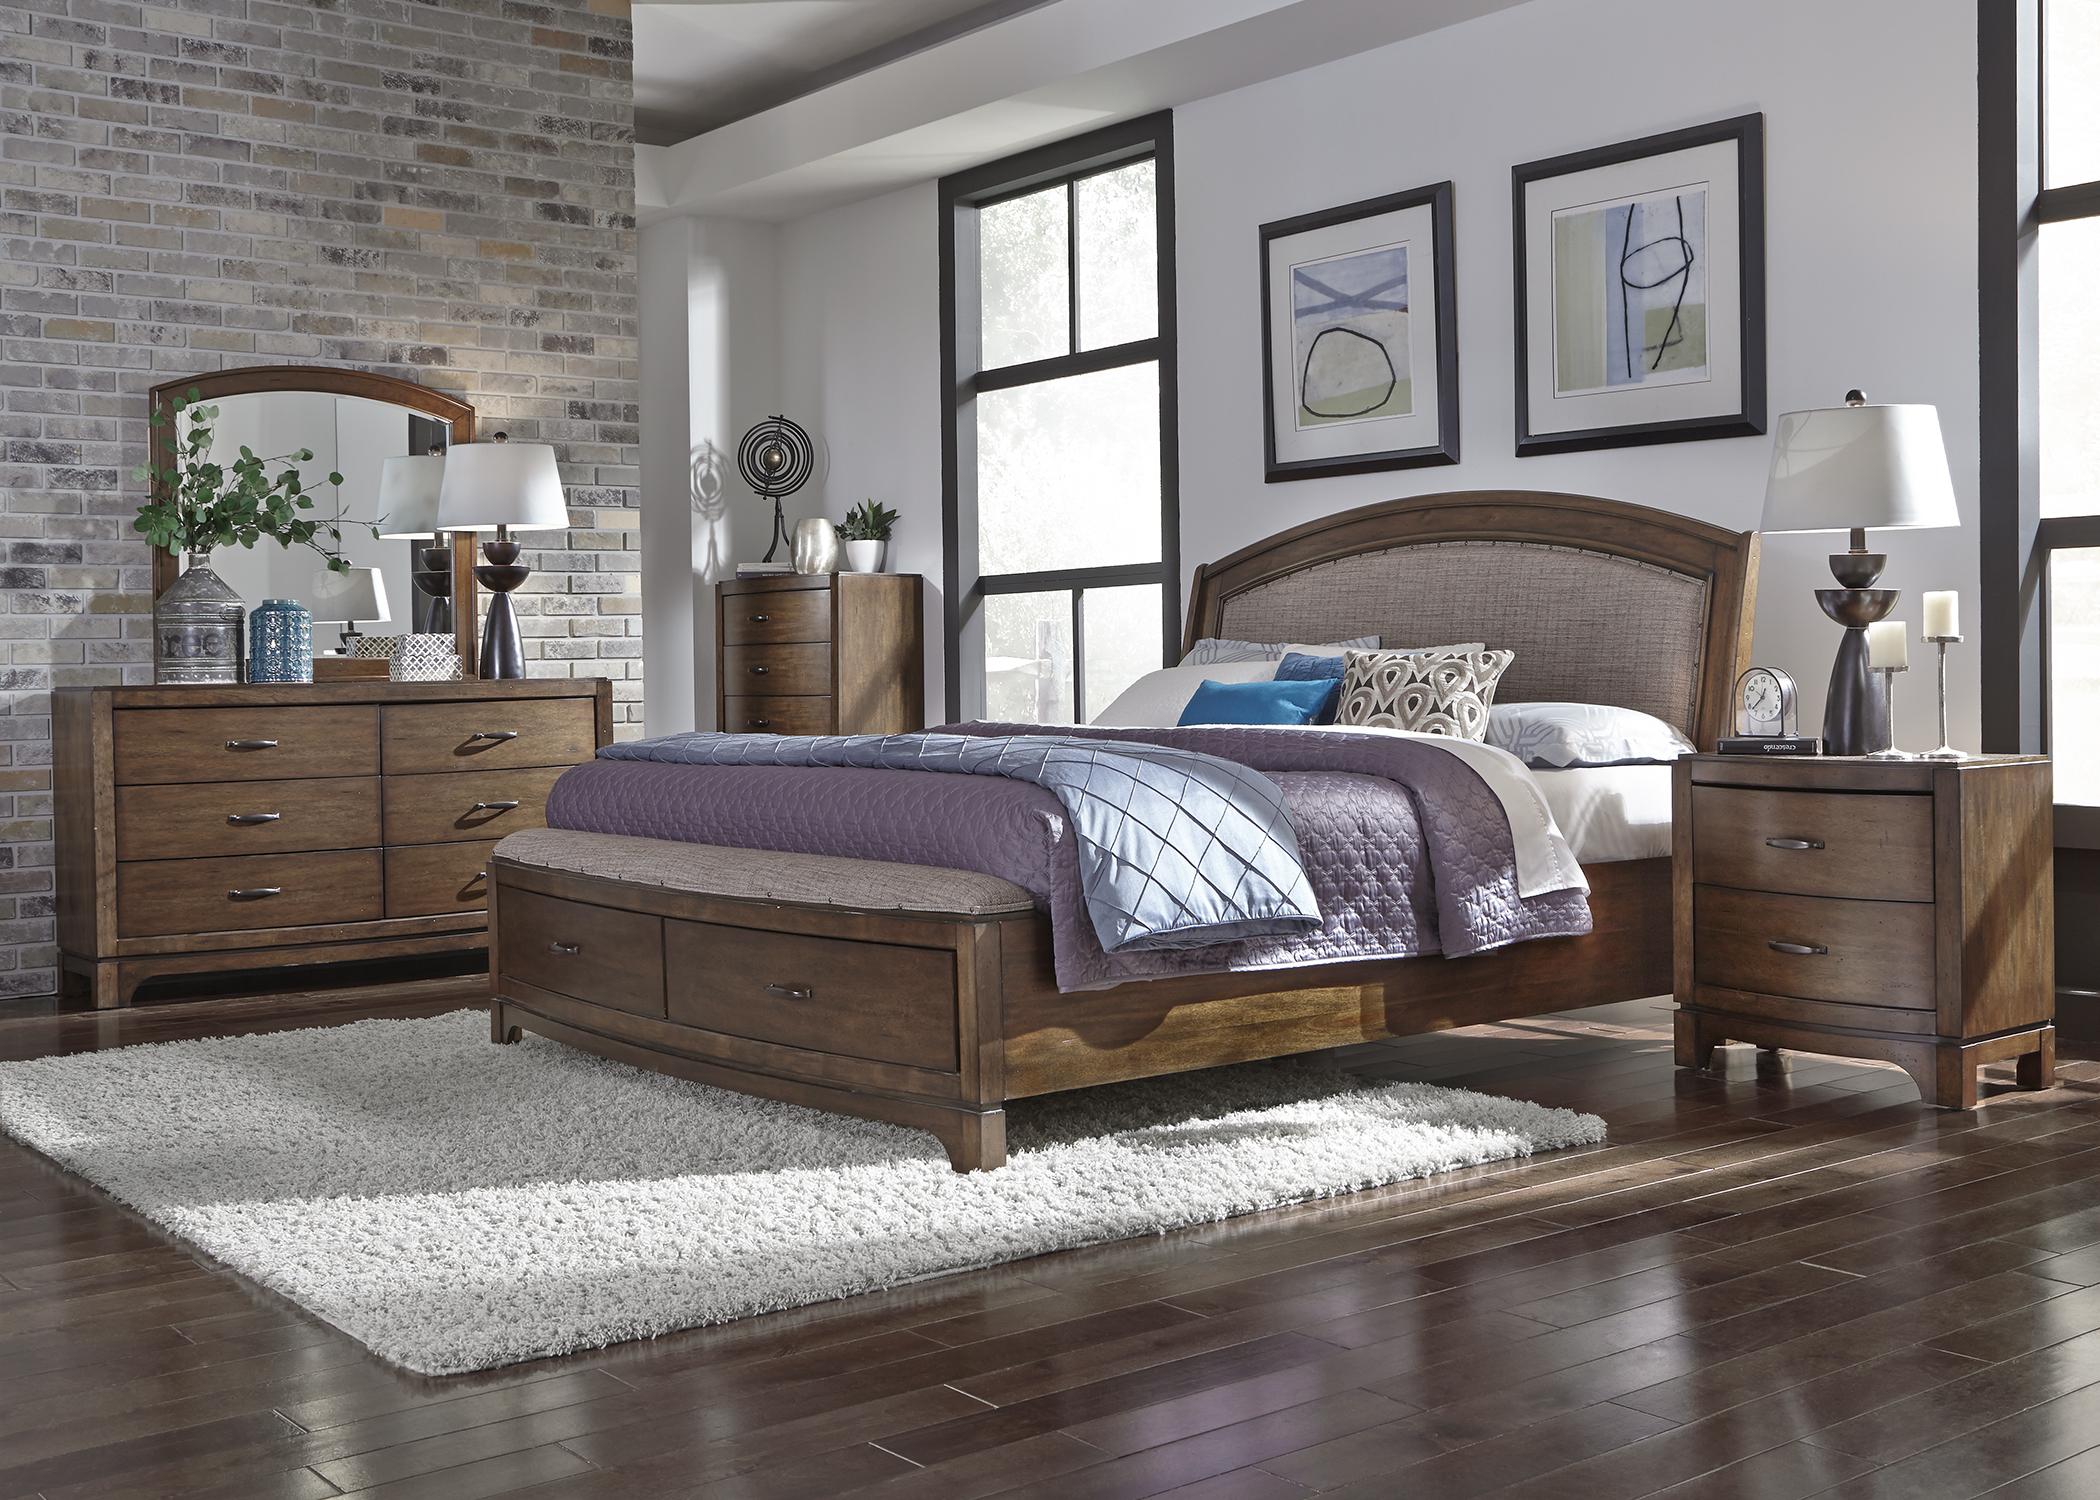 Liberty Avalon Iii Bedroom 705 Bed Dresser Mirror Chest